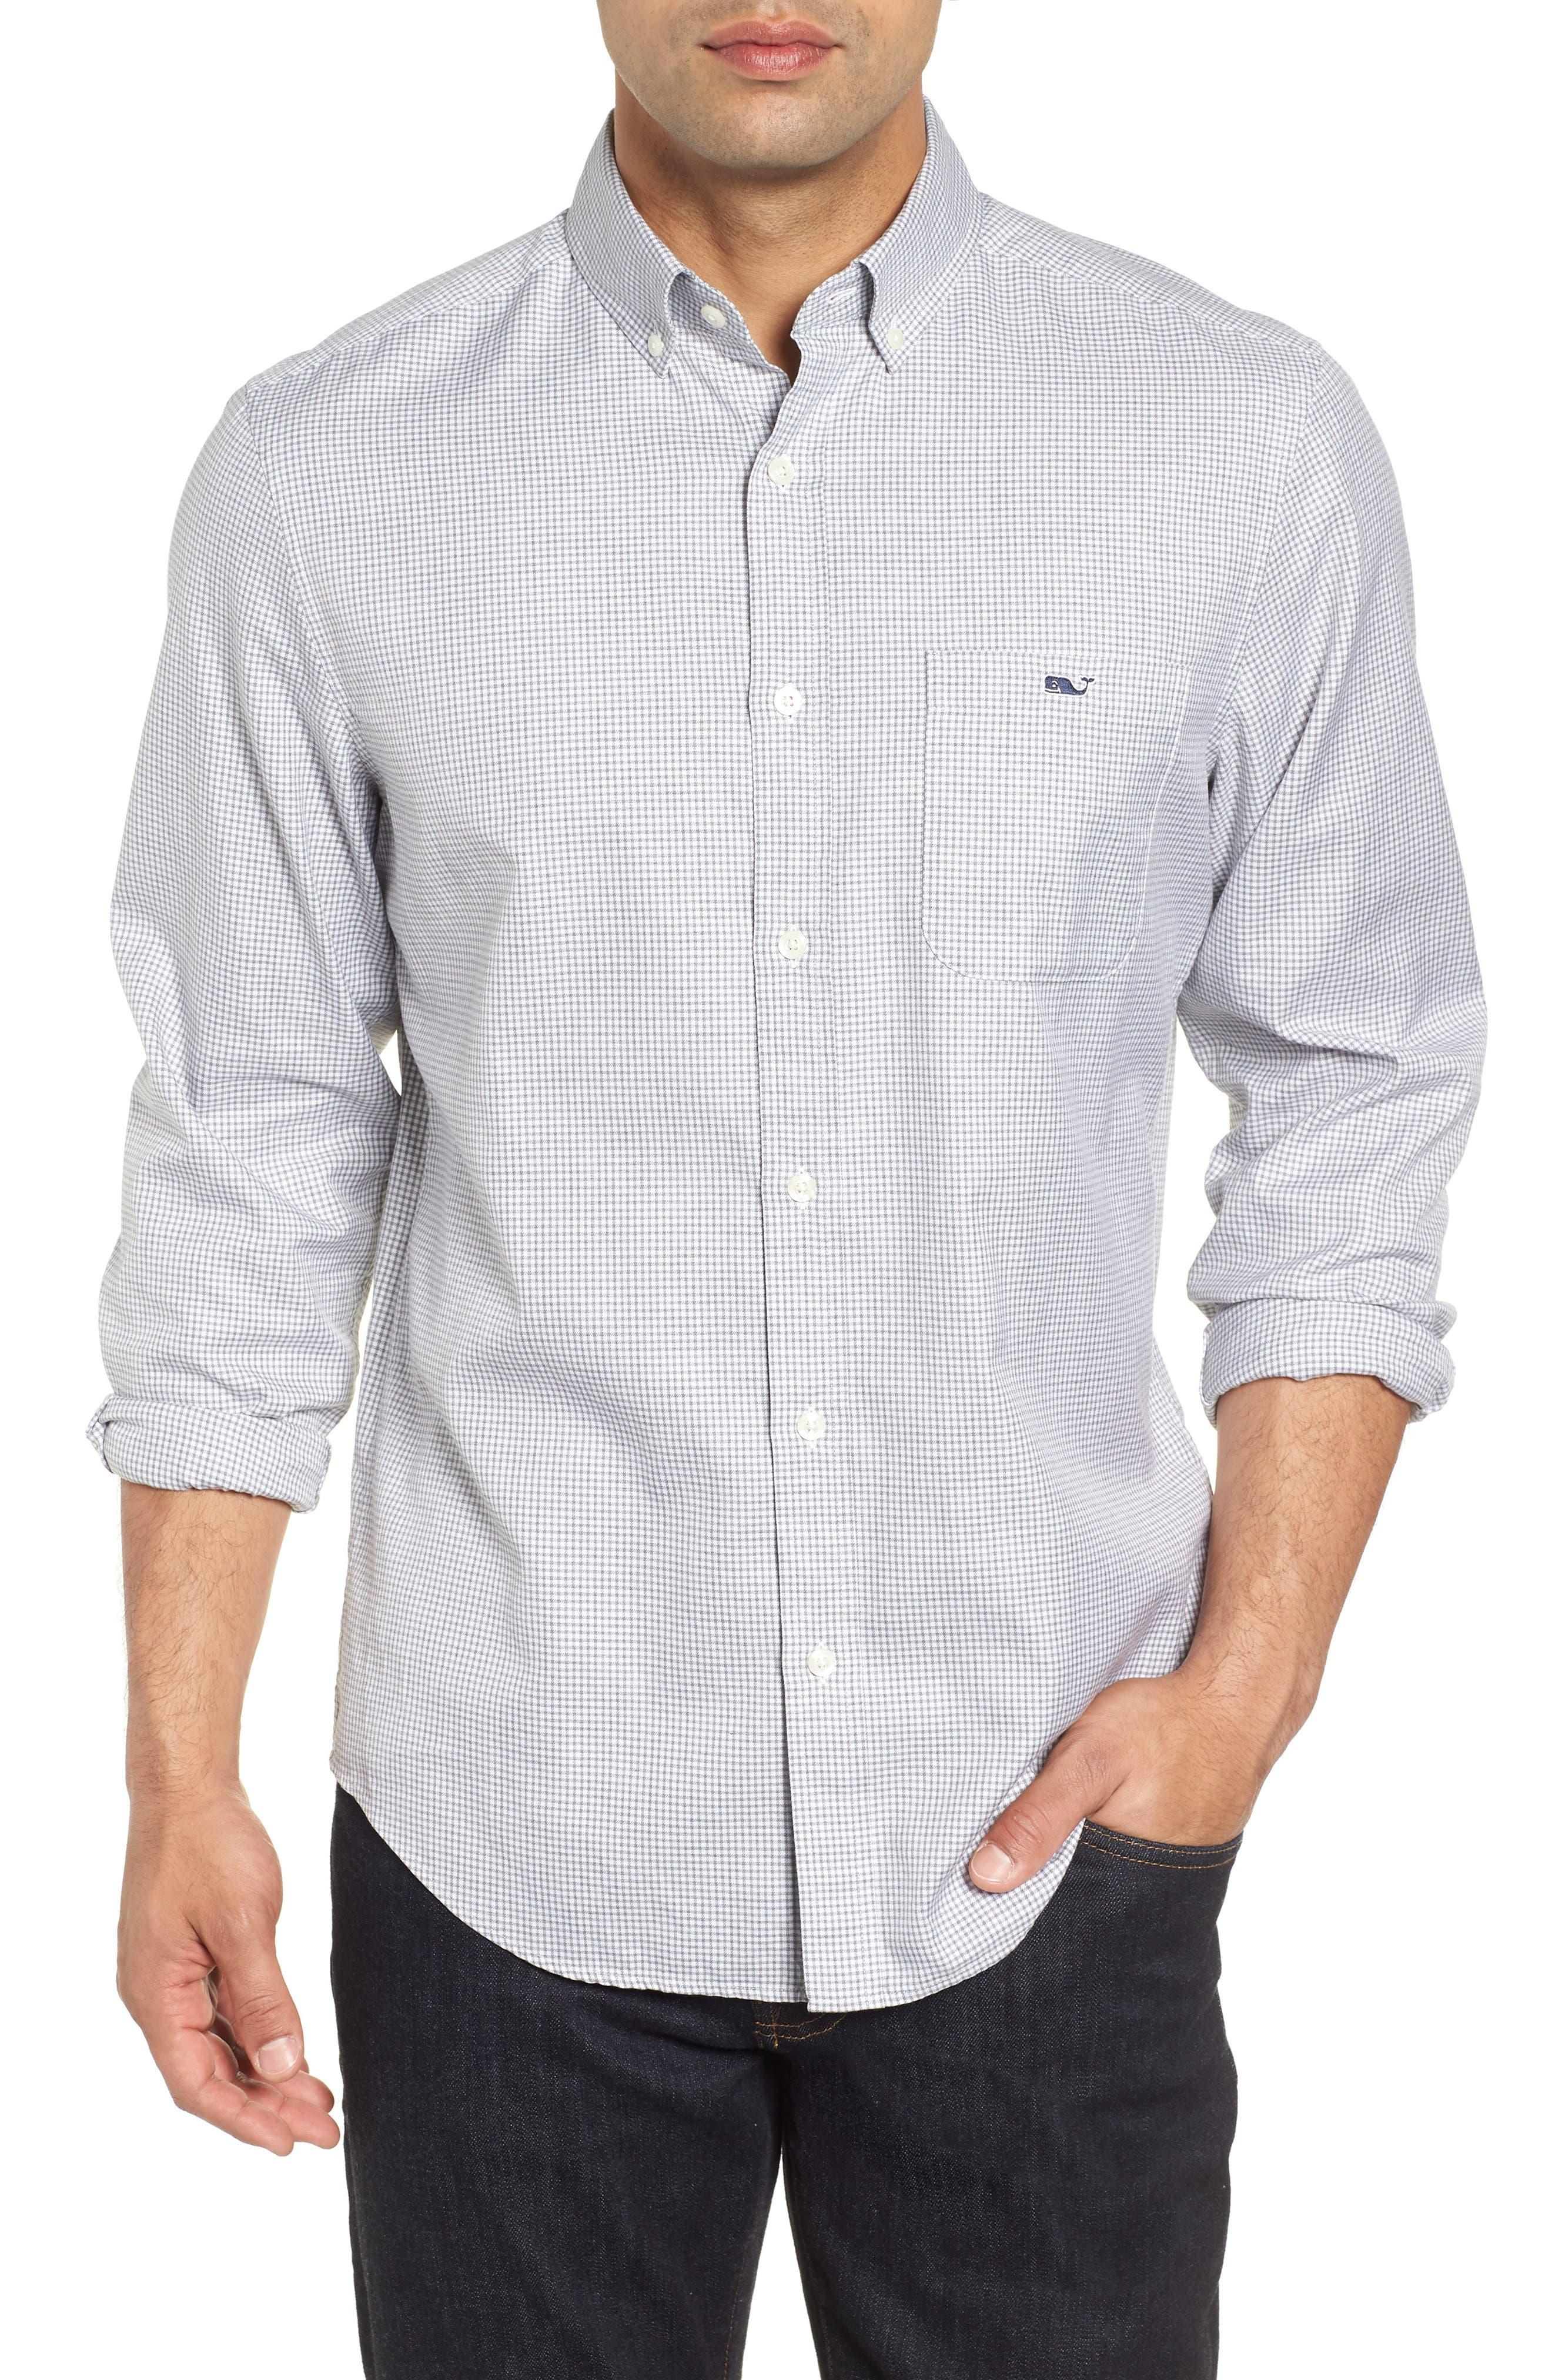 Kettle Cove Regular Fit Gingham Sport Shirt,                         Main,                         color, BARRACUDA